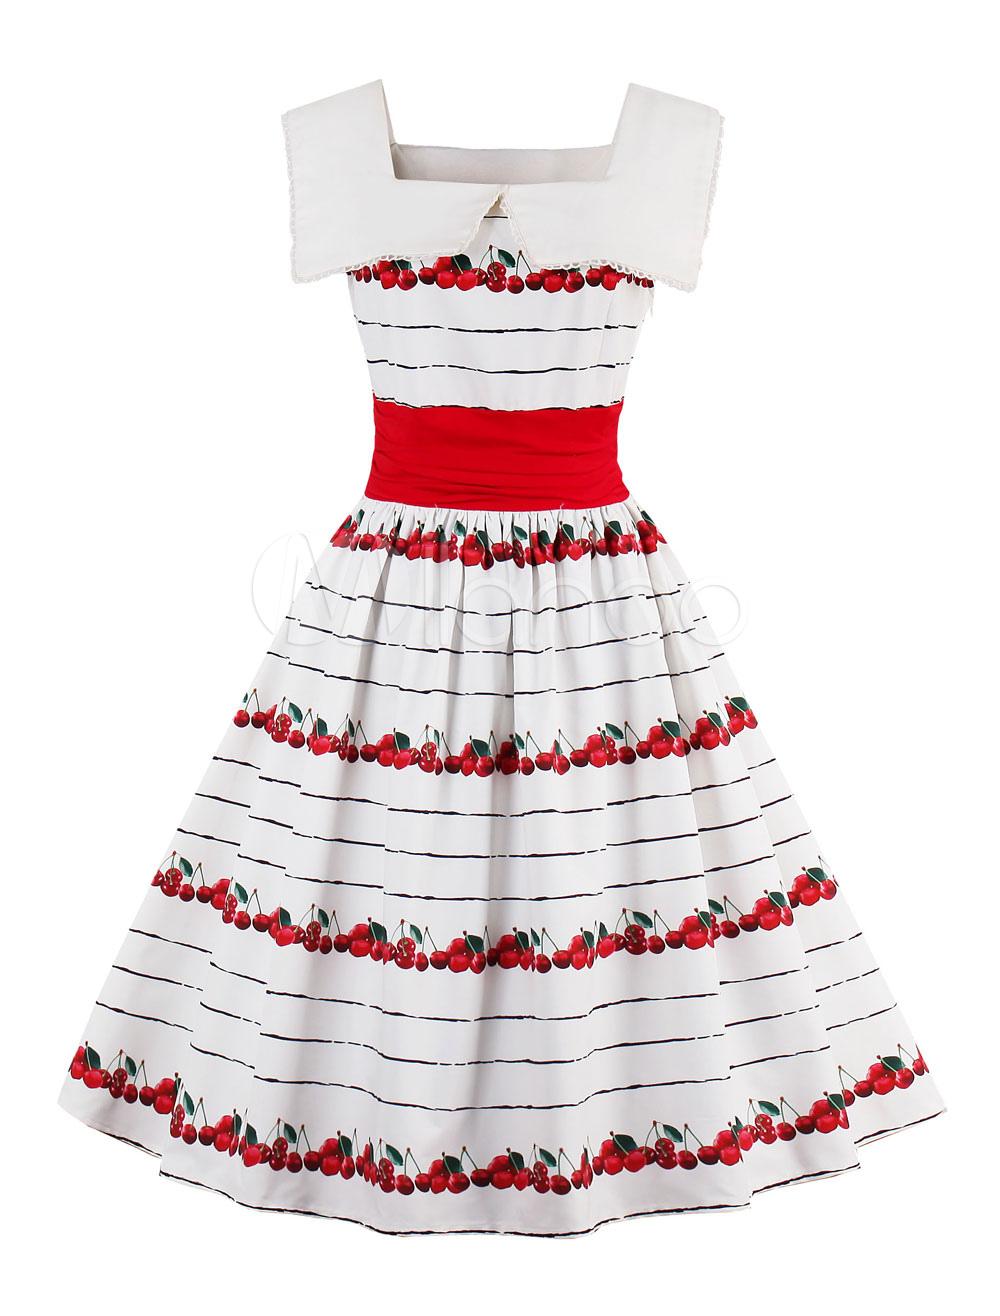 White Vintage Dress Lace Square Neck Sleeveless Fruit Print A Line Women's Short Dresses (Women\\'s Clothing Vintage Dresses) photo